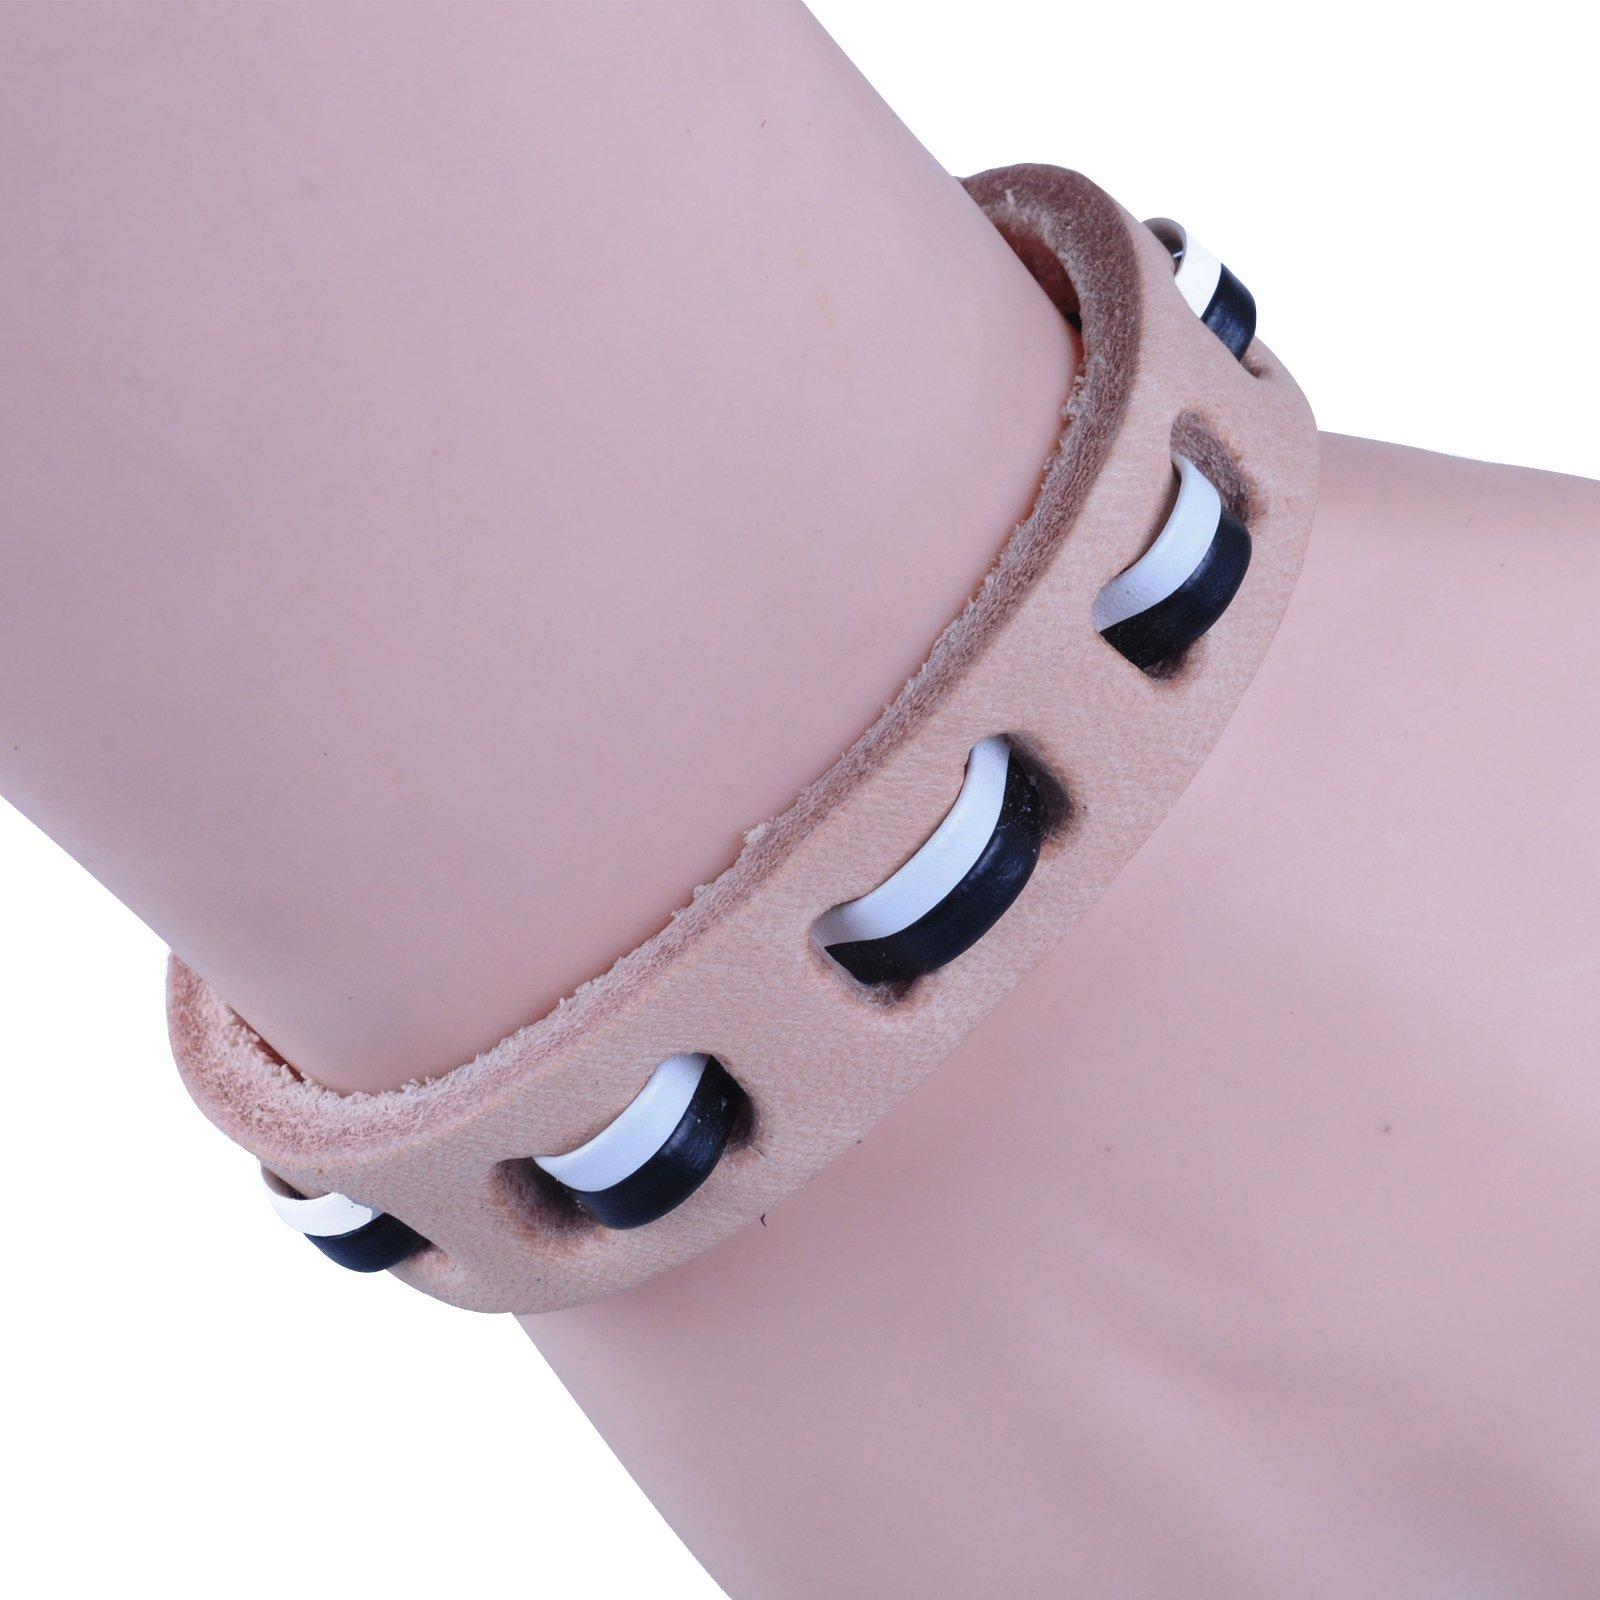 New-Fawn-Orange-Brown-Unisex-Genuine-Leather-Adjustable-Bracelets-Gift-086USANNA miniature 10